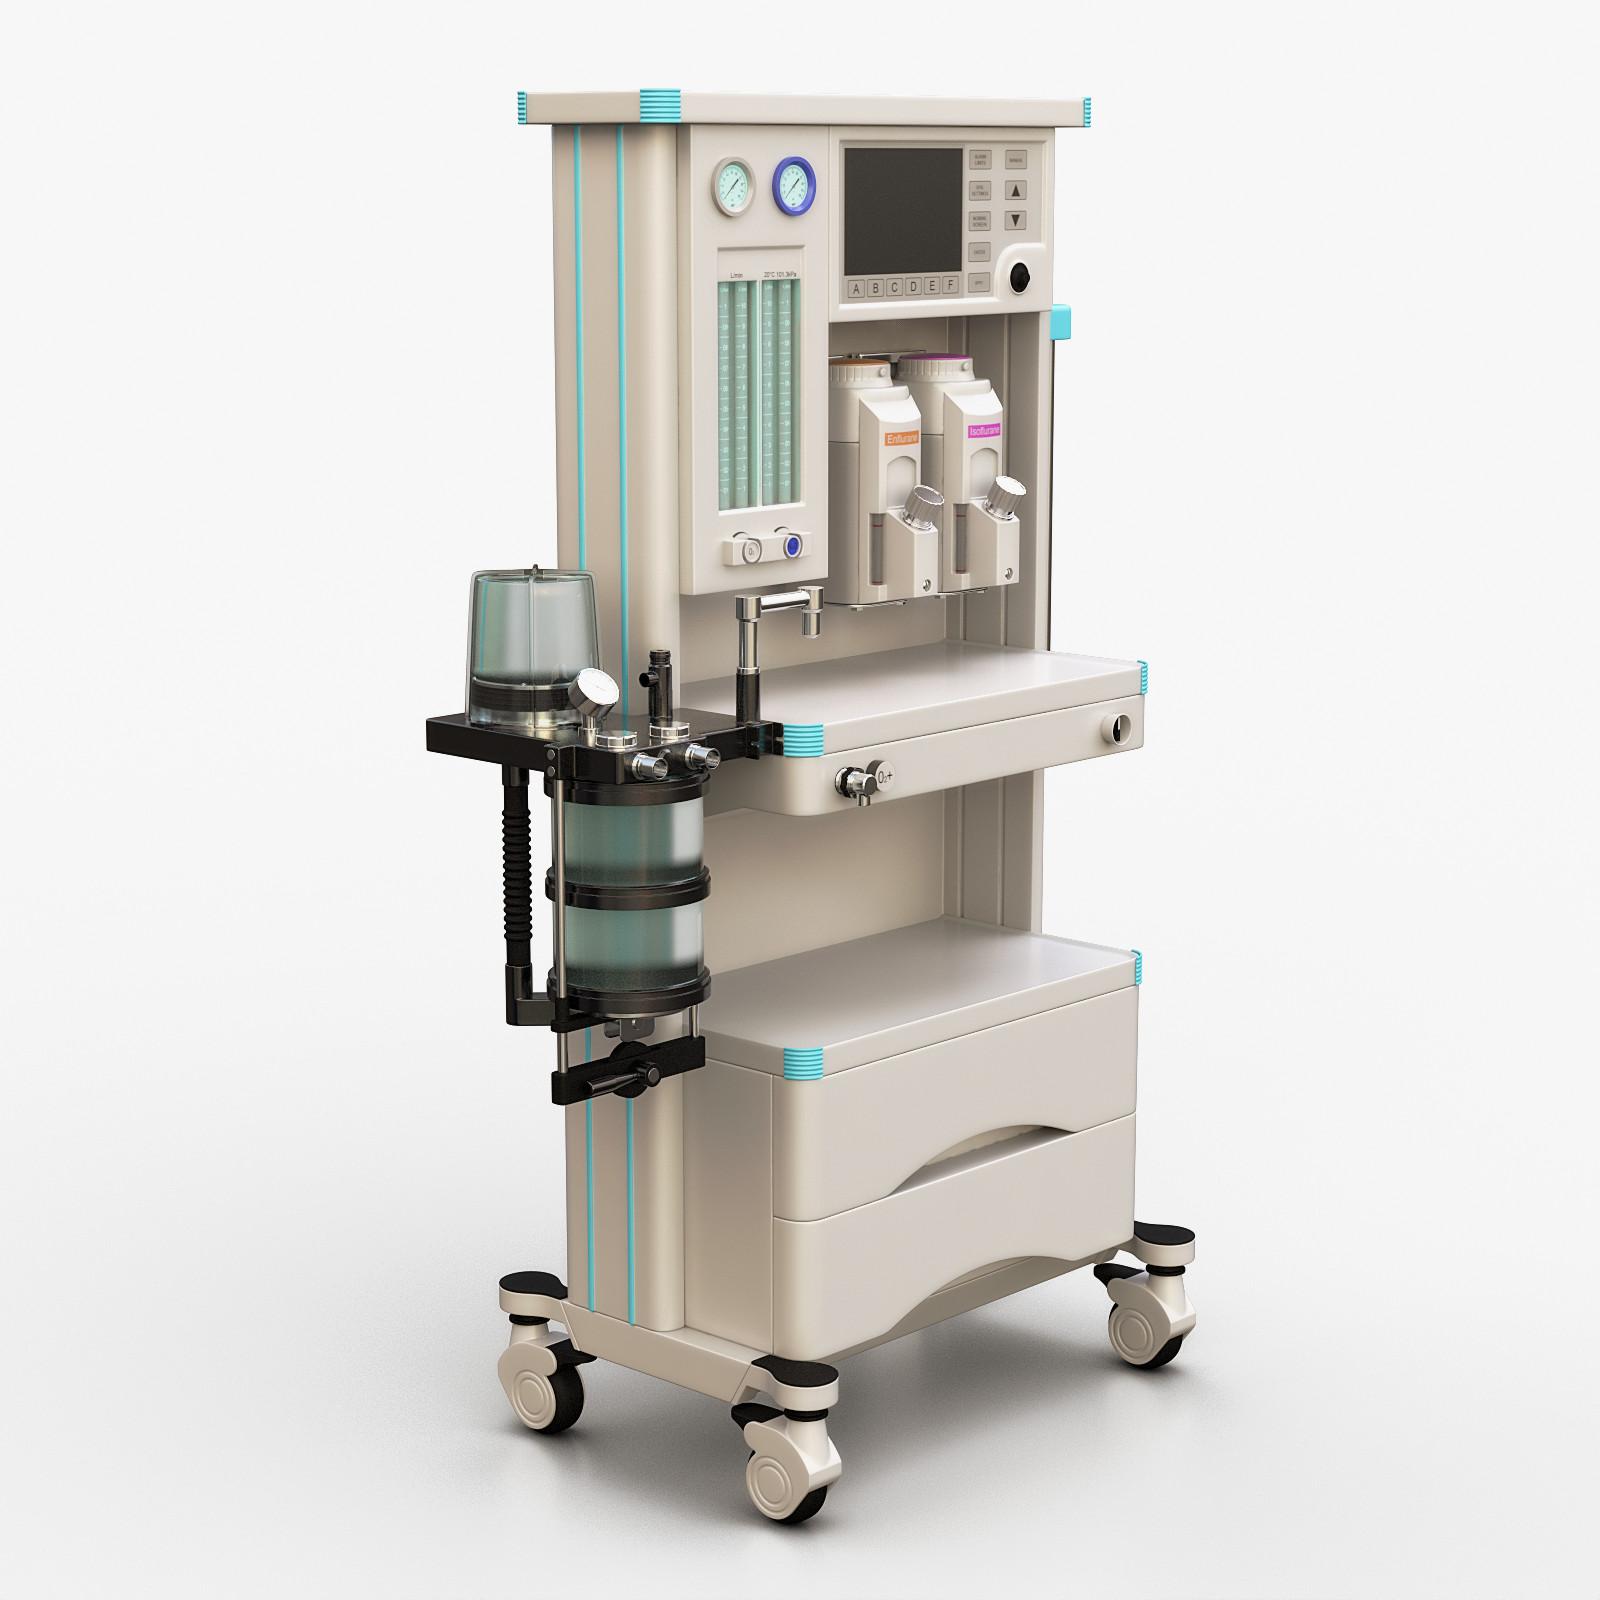 anesthesia_machine_signature_01.png